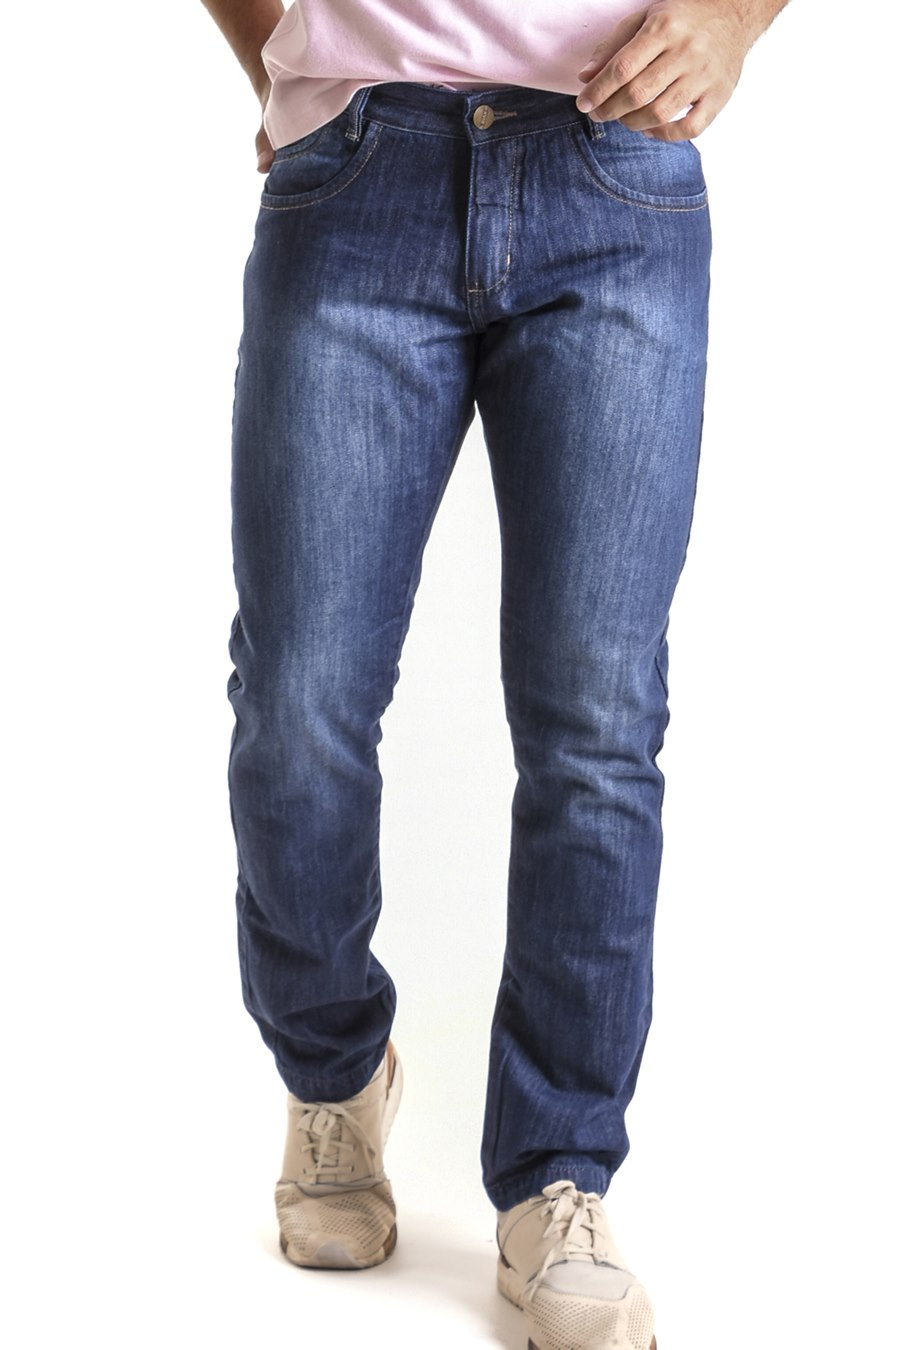 e89ab3ca4 Calça Jeans Ant Fit 2128108 - DNA Jeans Store